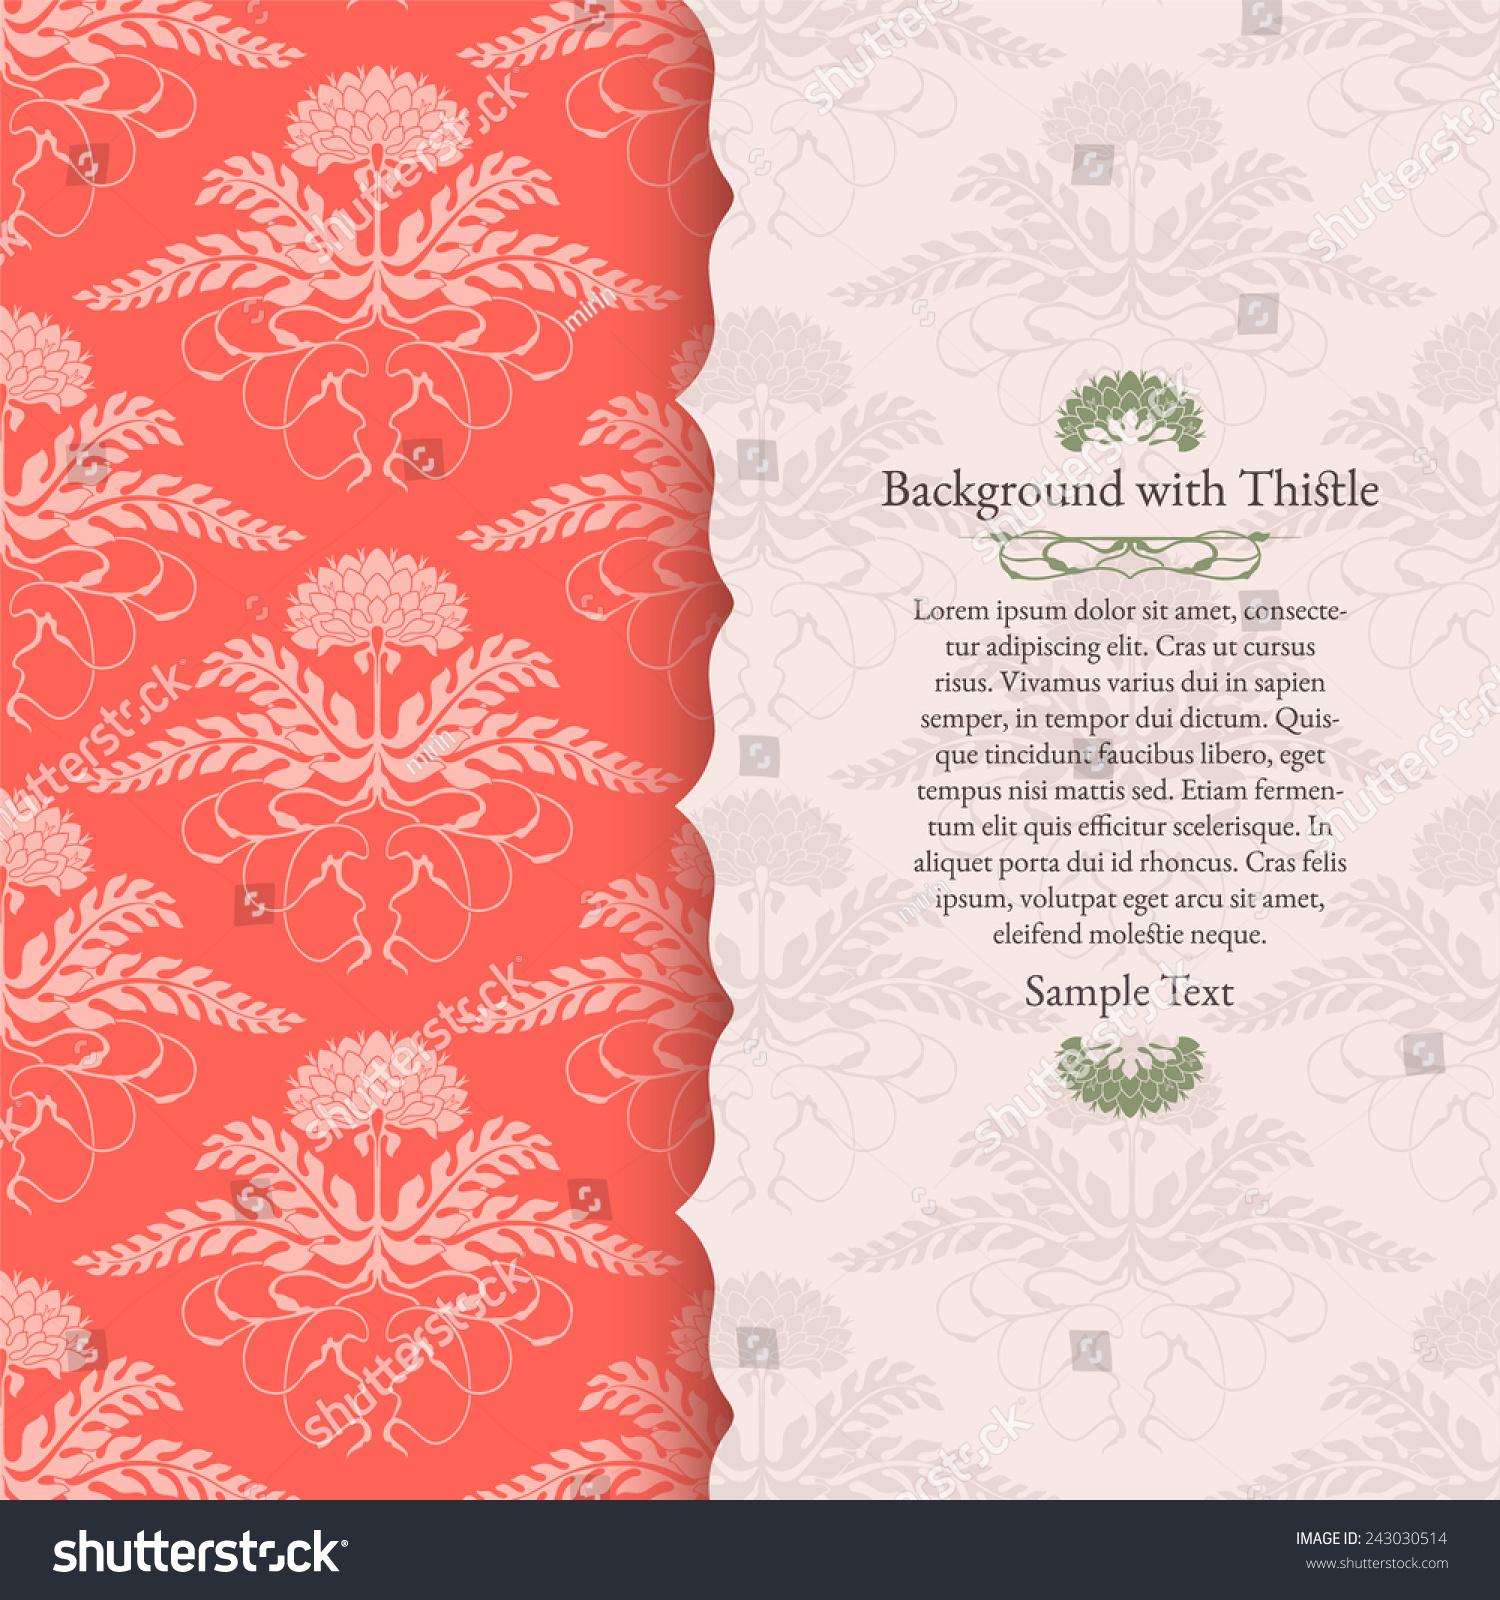 Thistle Themed Wedding Invitations - The Best Wedding 2018